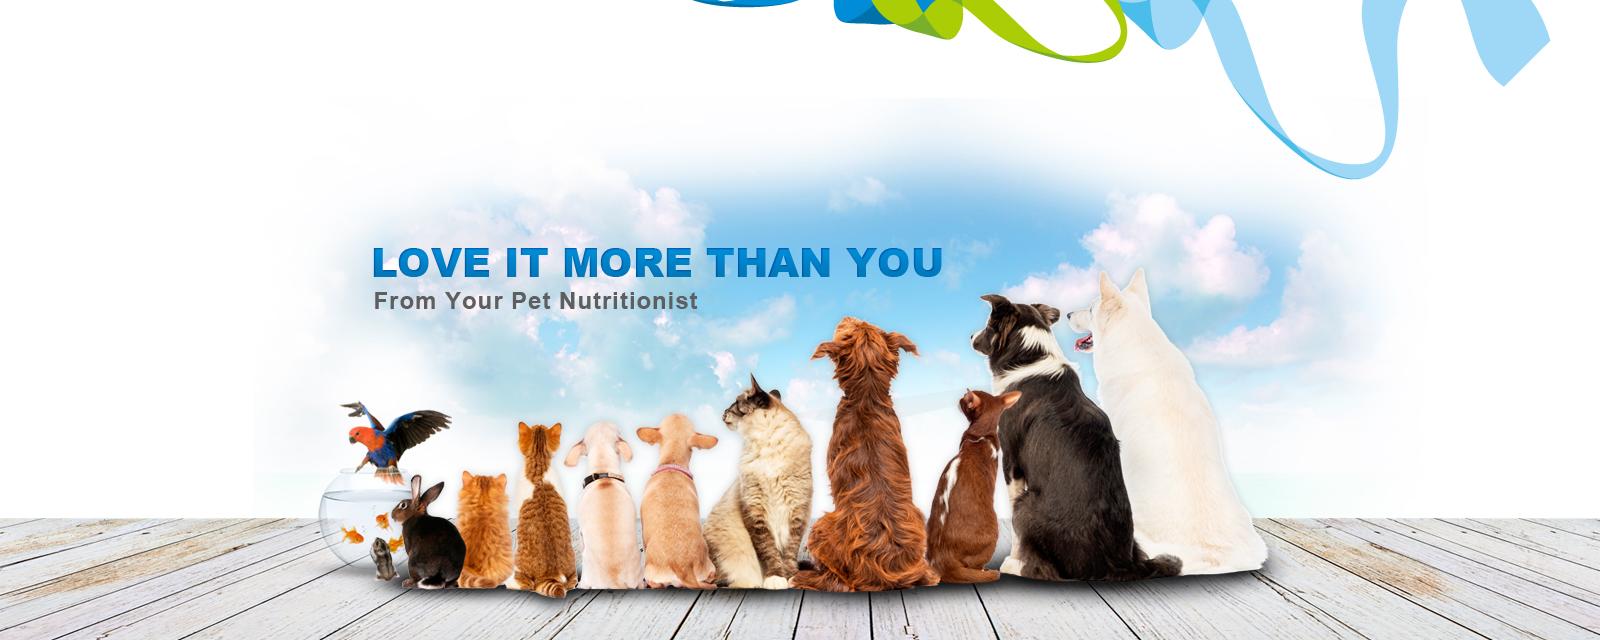 Pet Food, Pet Supplies Manufacturer - Global-Pets Products